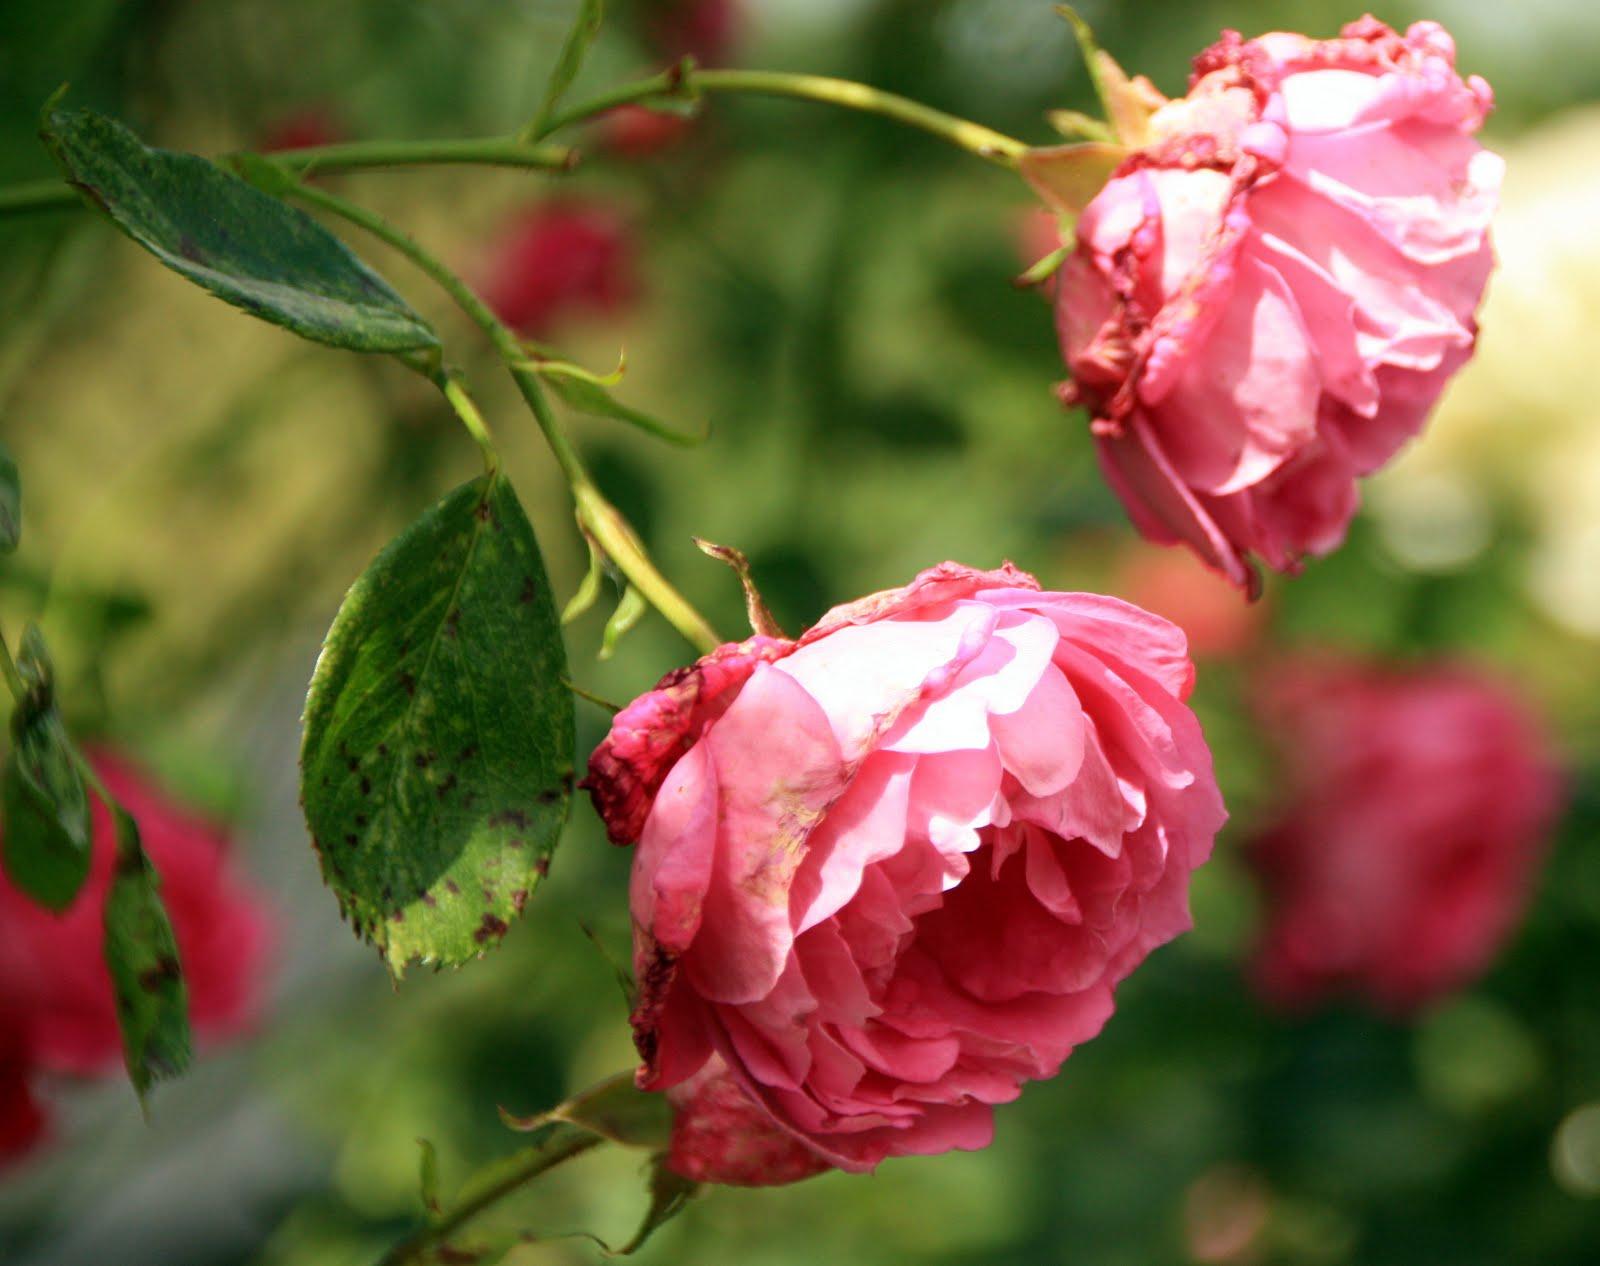 Lad Romantikken Blomstre